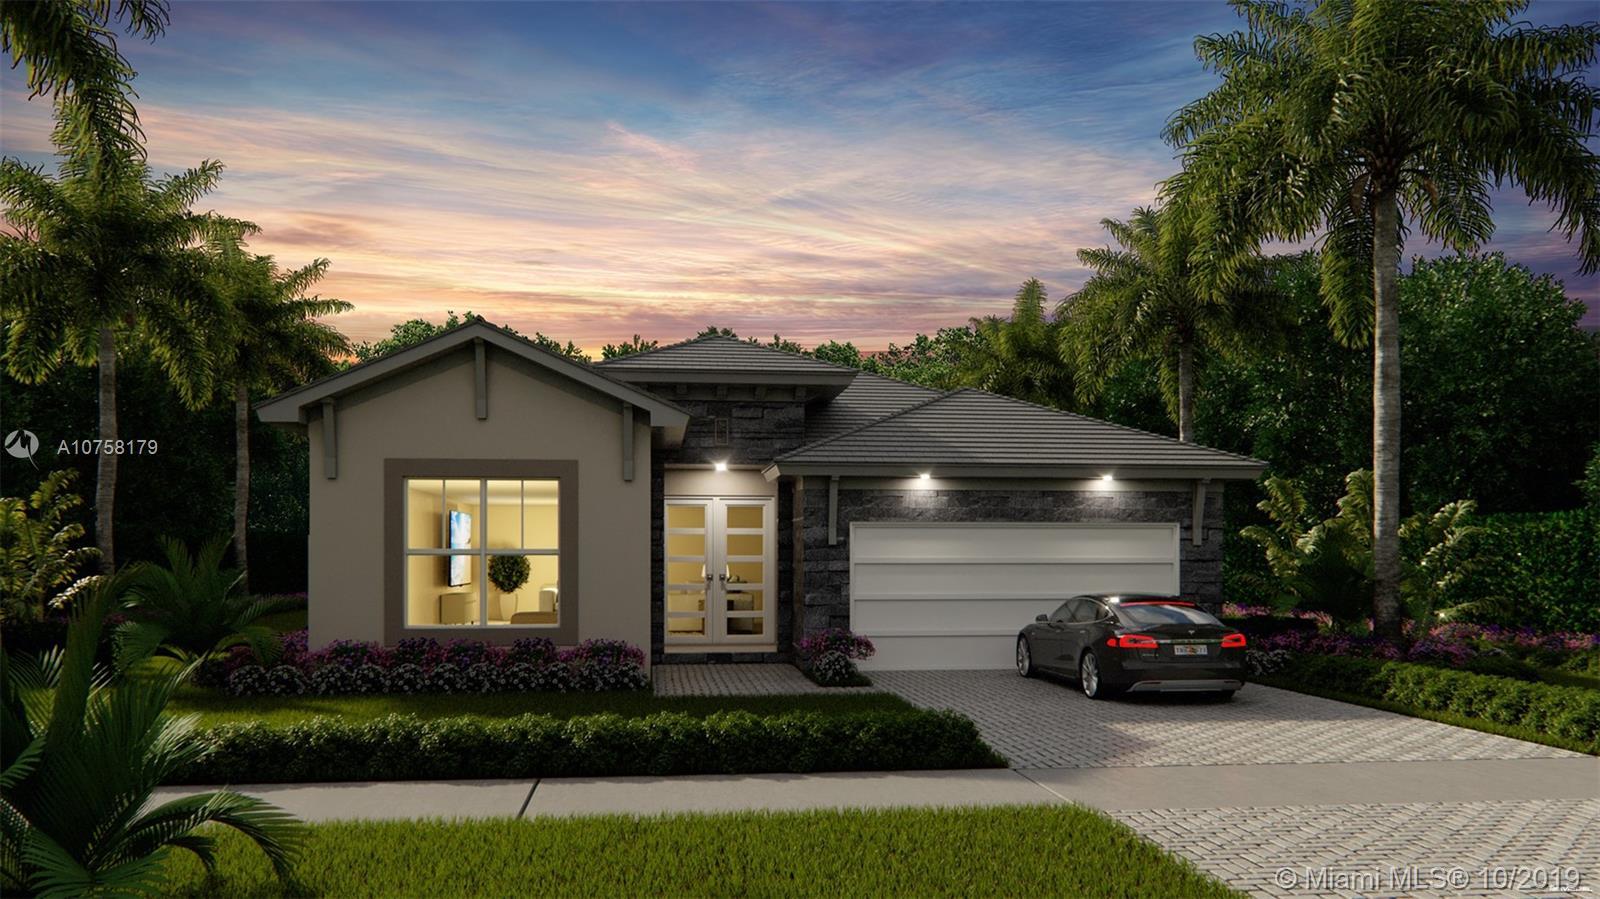 16601 SW 292 ST, Homestead, FL 33030 - Homestead, FL real estate listing